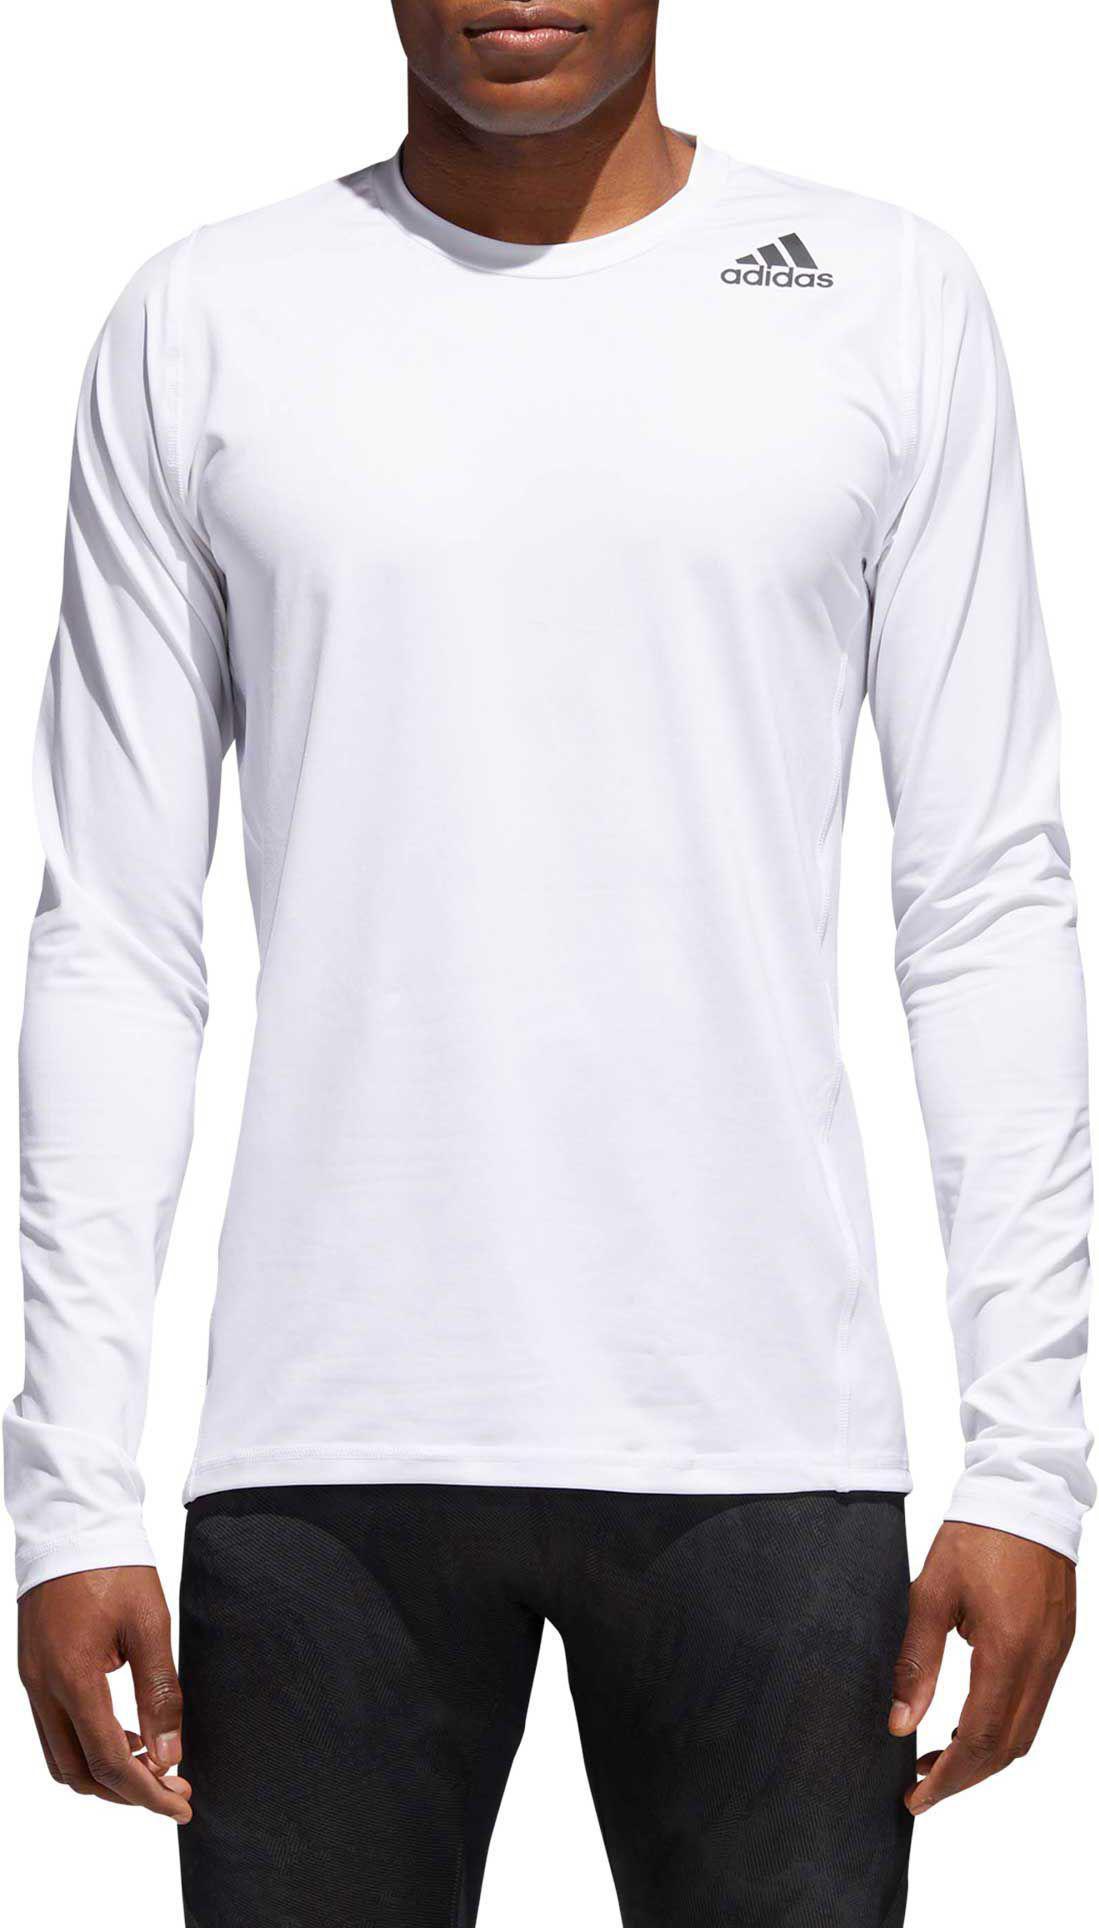 bbf5b59c3 Adidas - White Alphaskin Sport Fitted Long Sleeve Training T-shirt for Men  - Lyst. View fullscreen